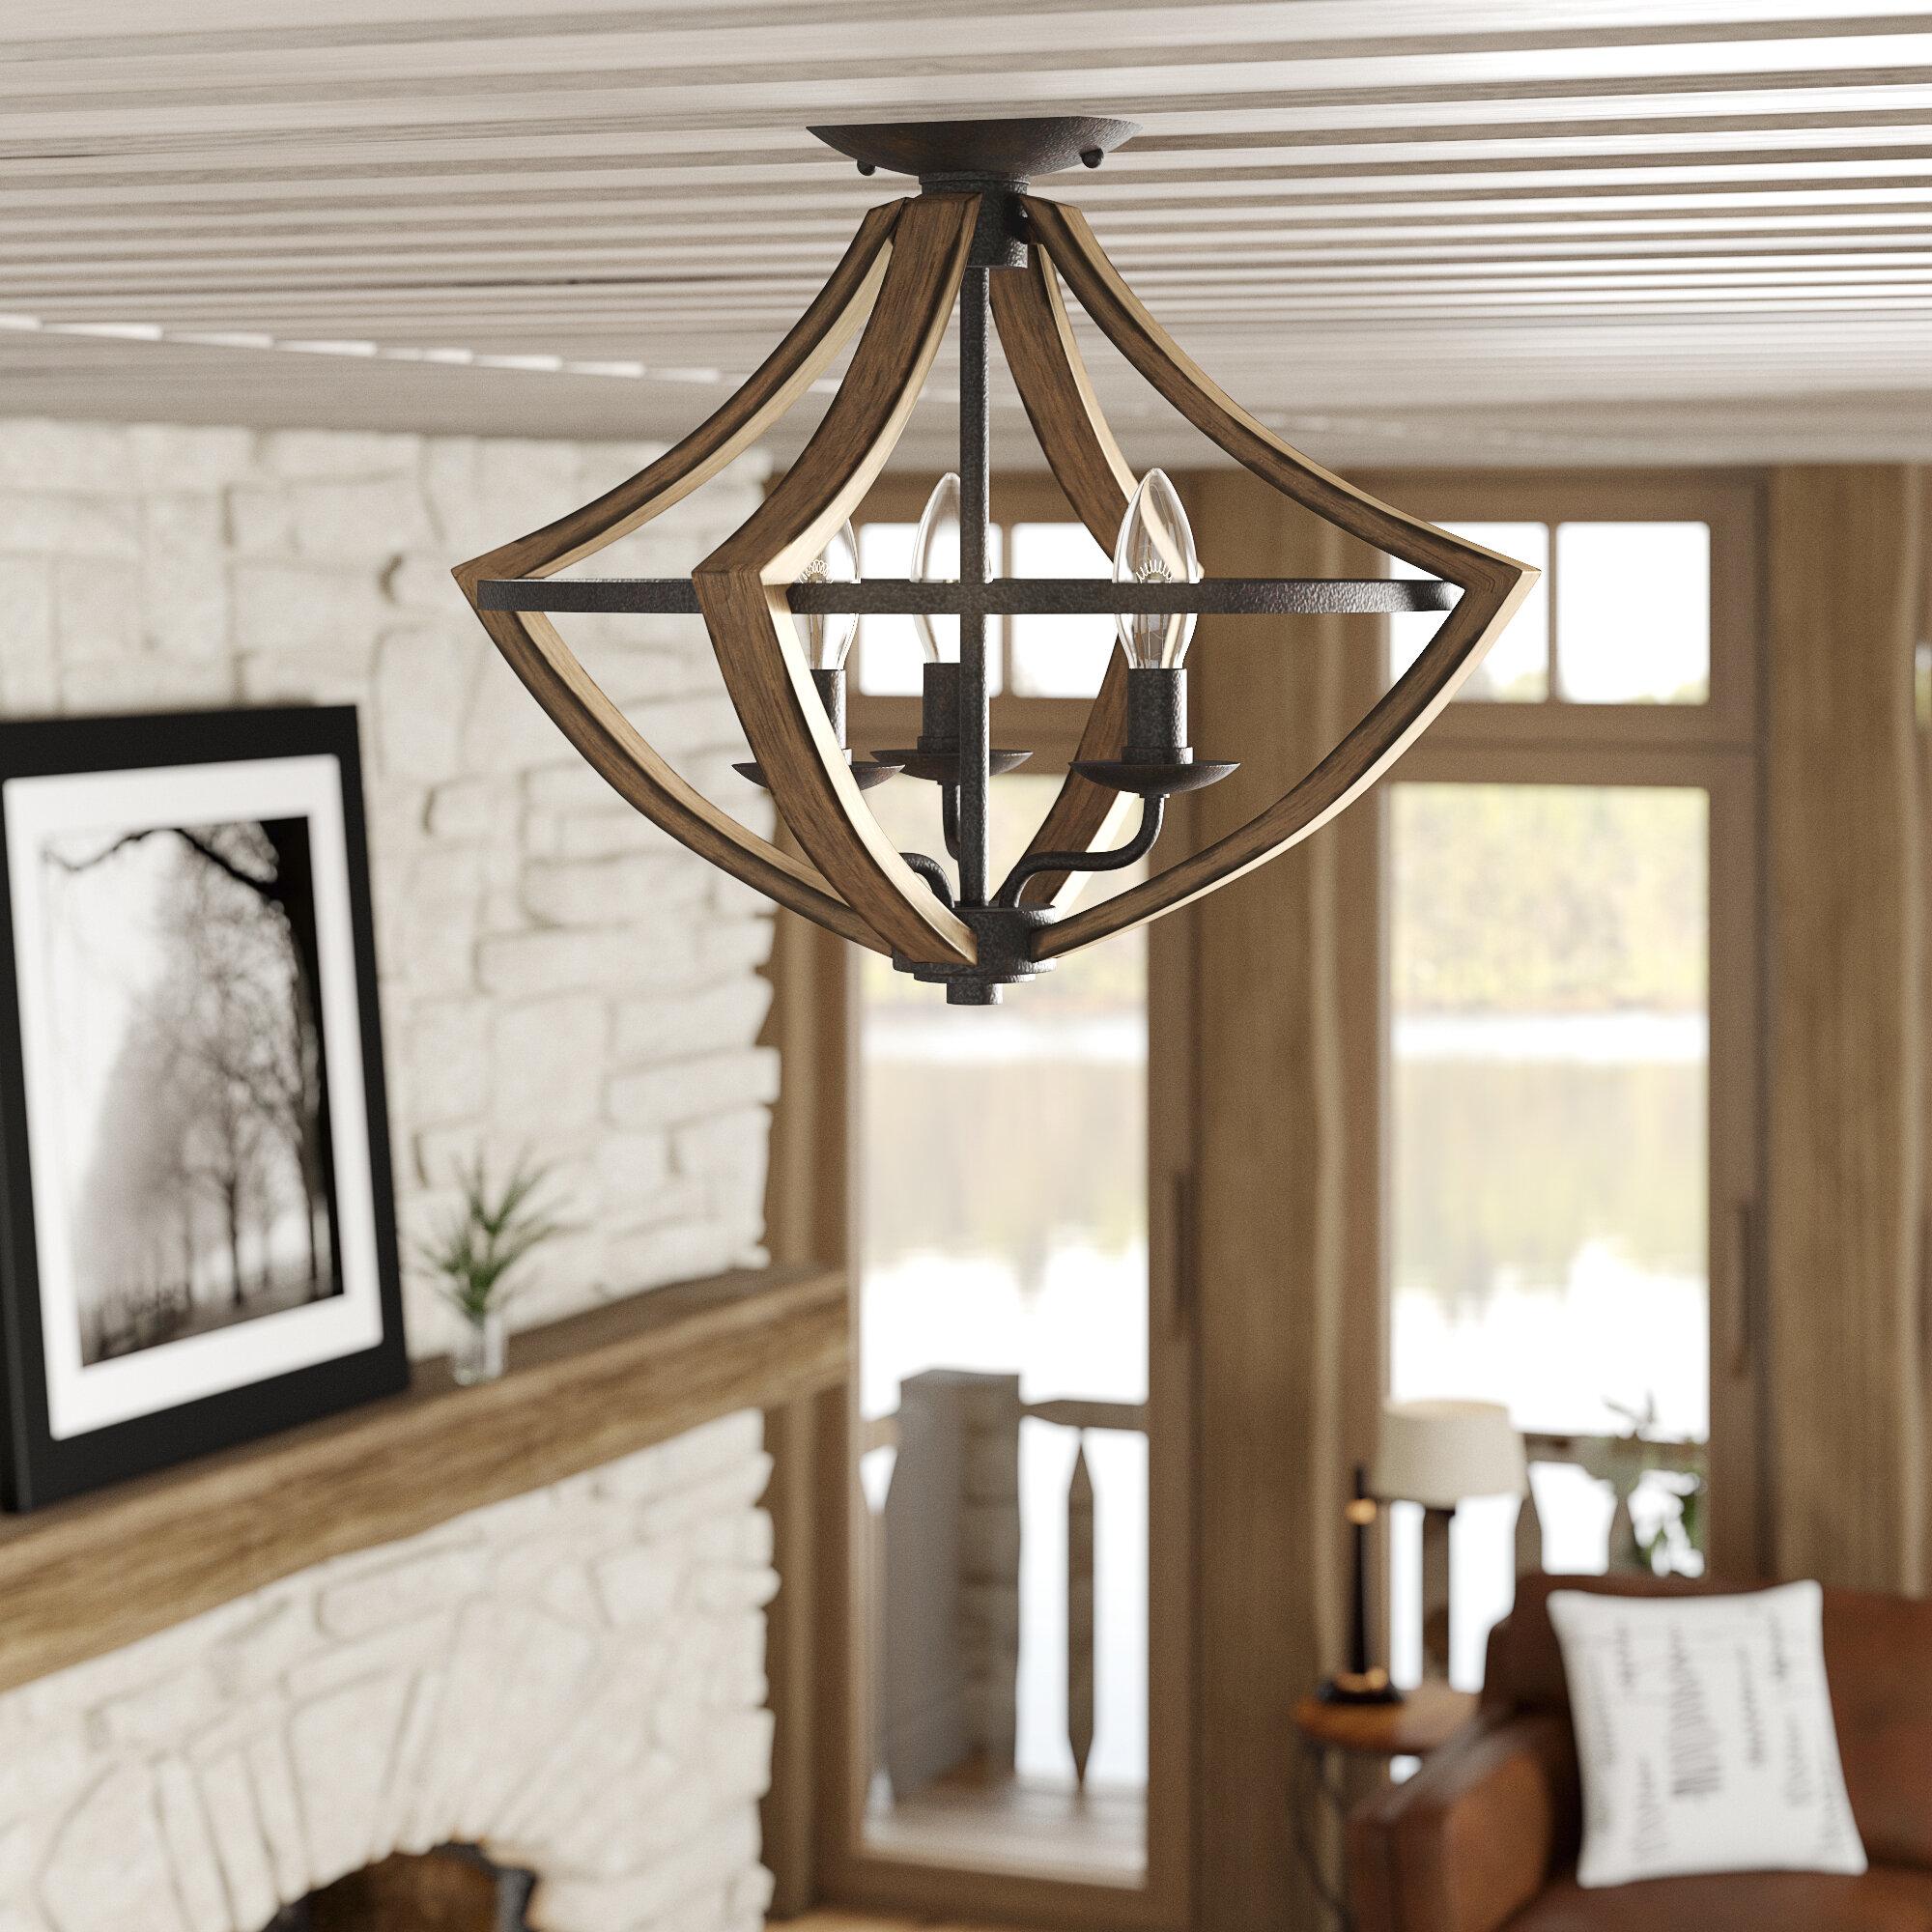 Flush mount lighting for low ceiling living room | Source: wayfair.com